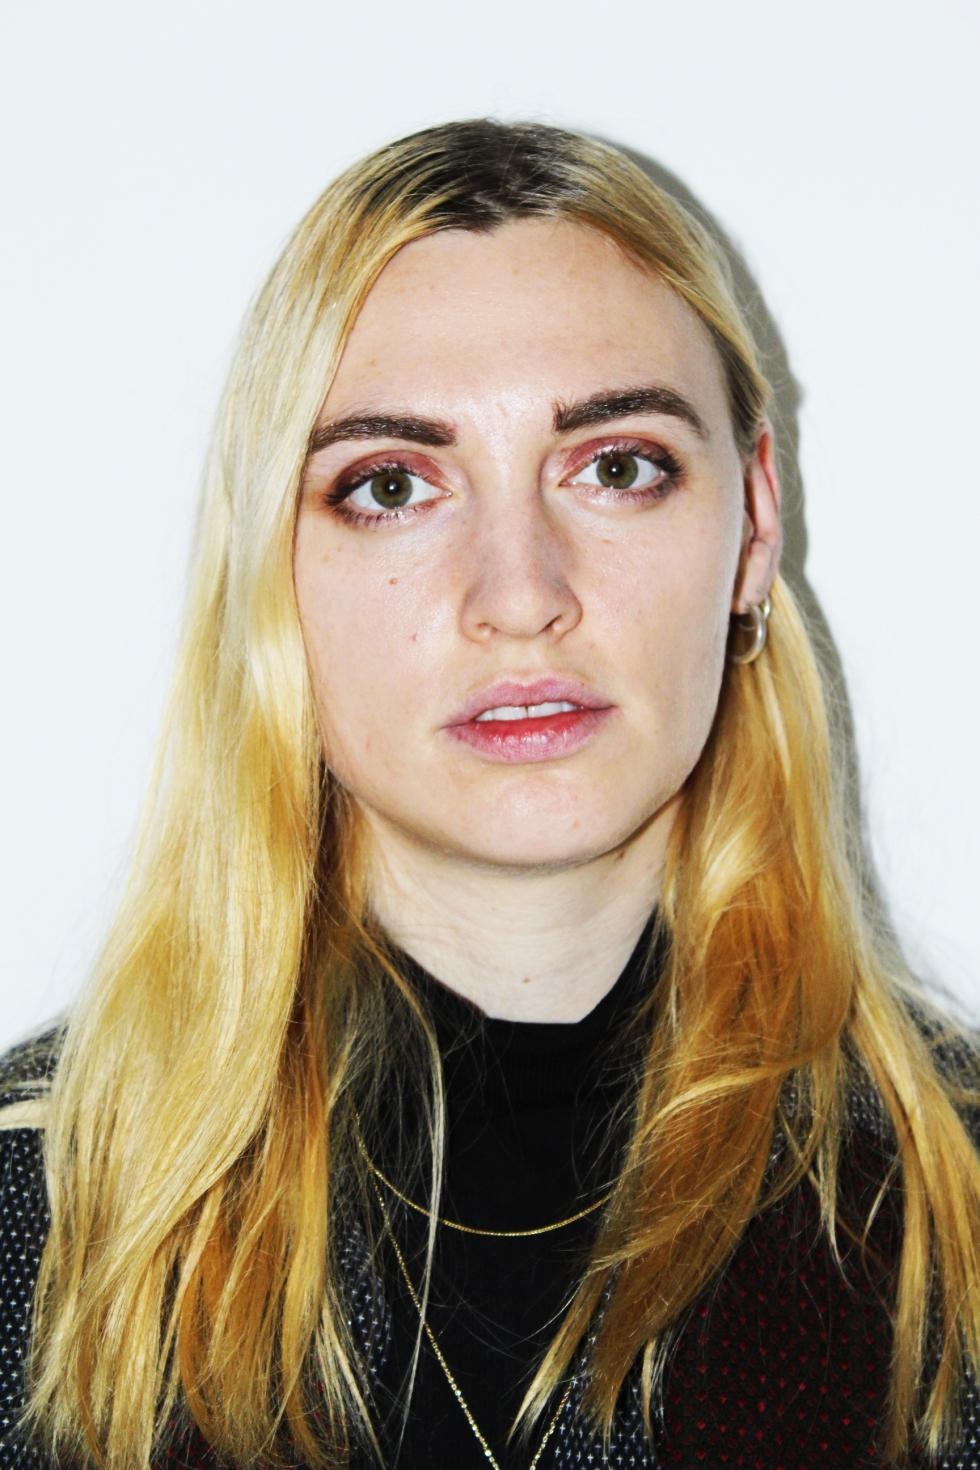 Emma2